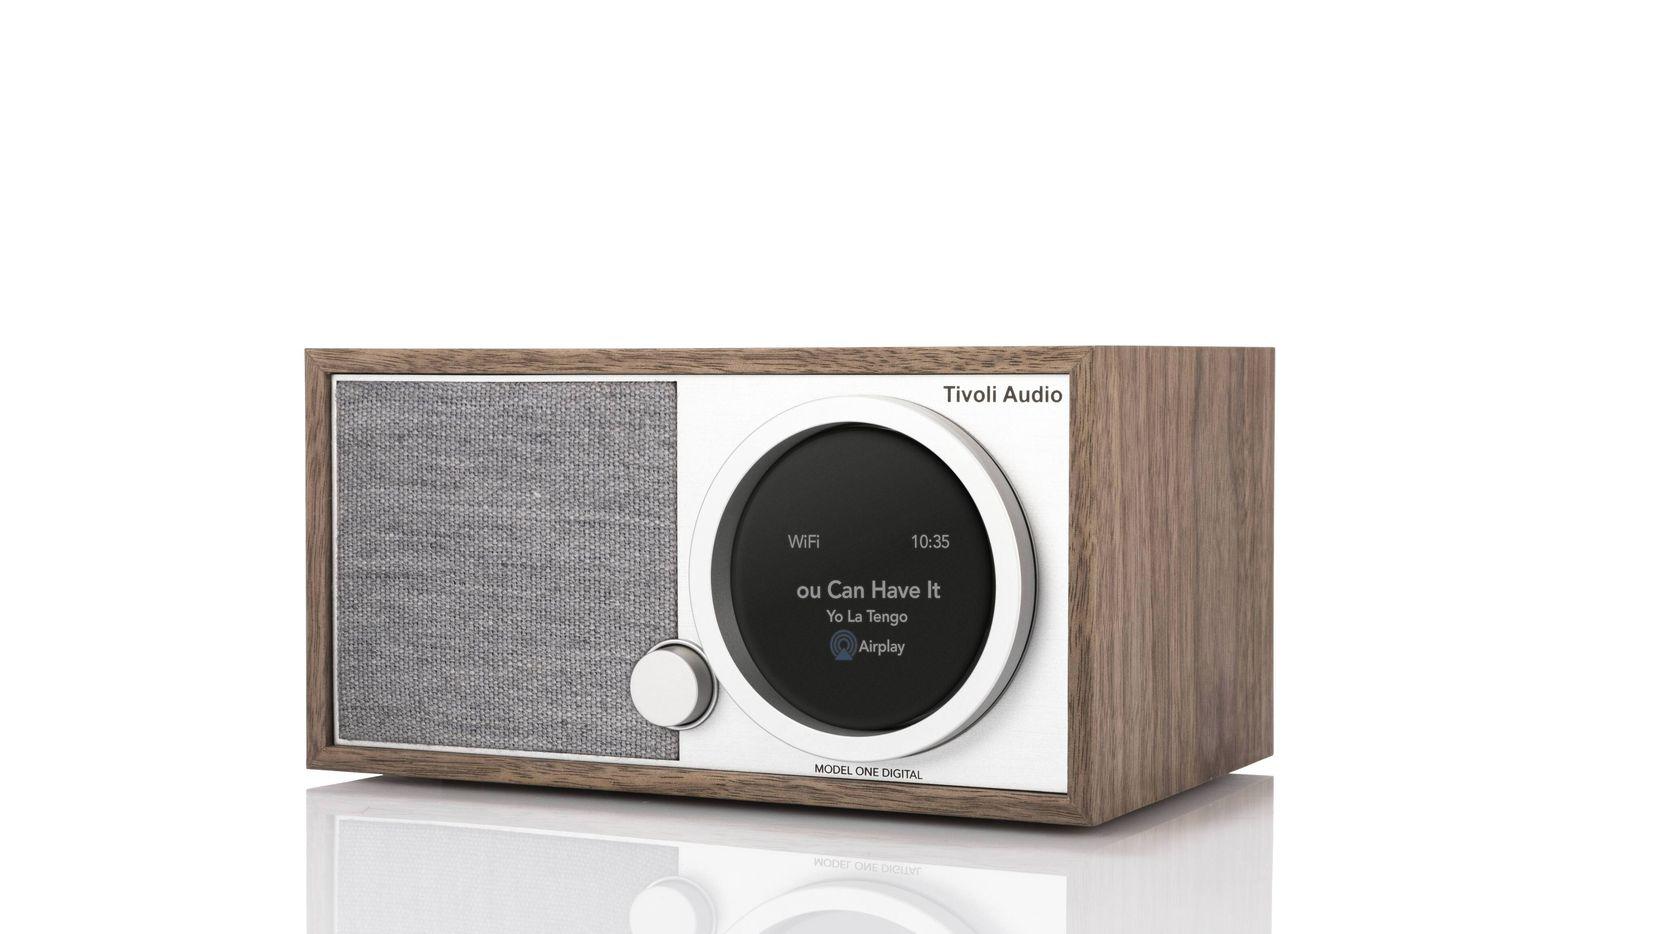 The Tivoli Model One Digital Generation 2.